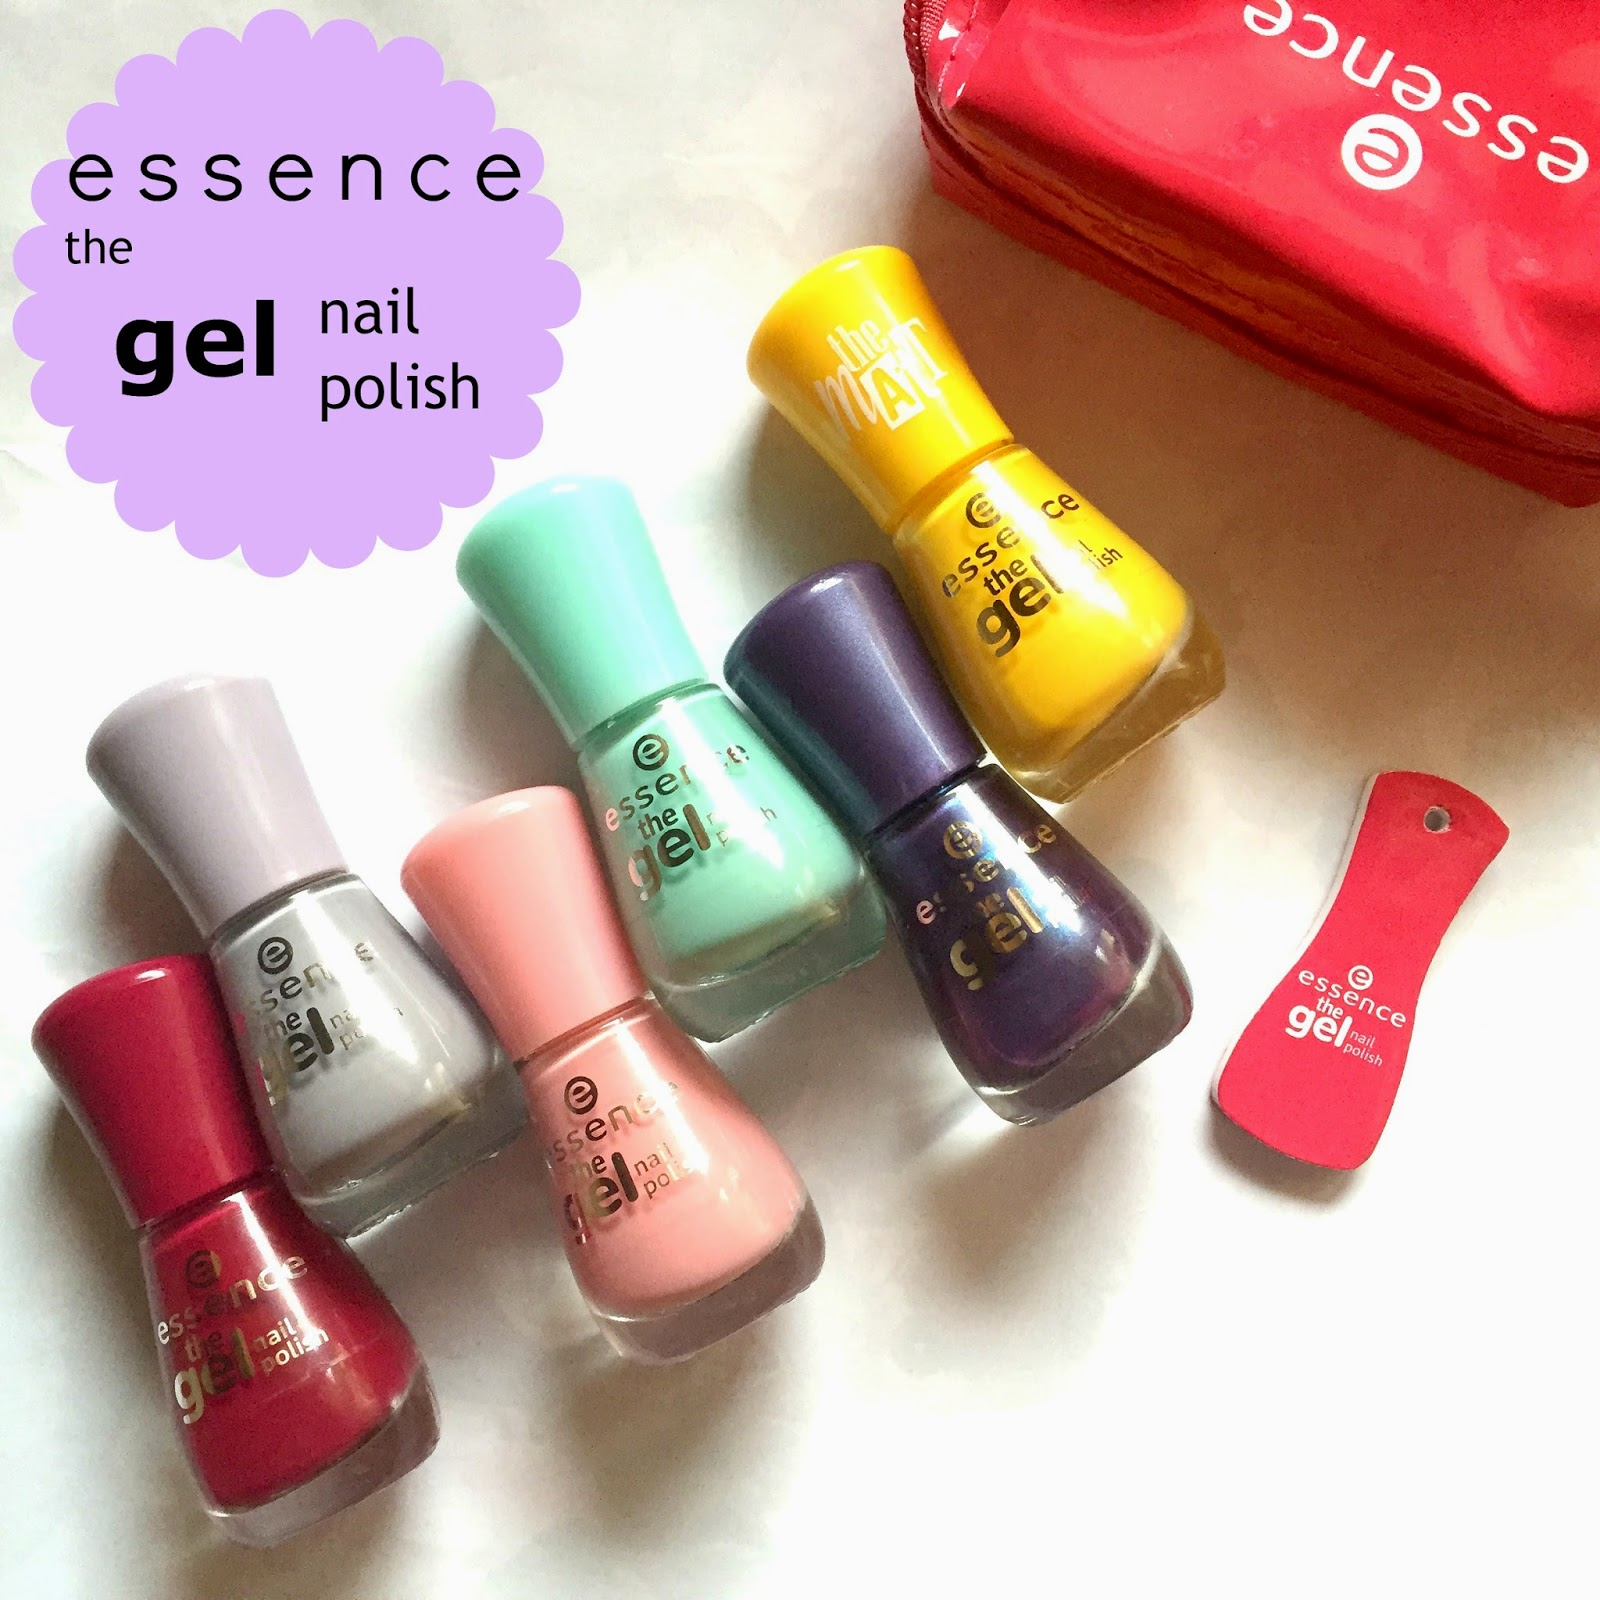 Essence 'the gel nail polish'